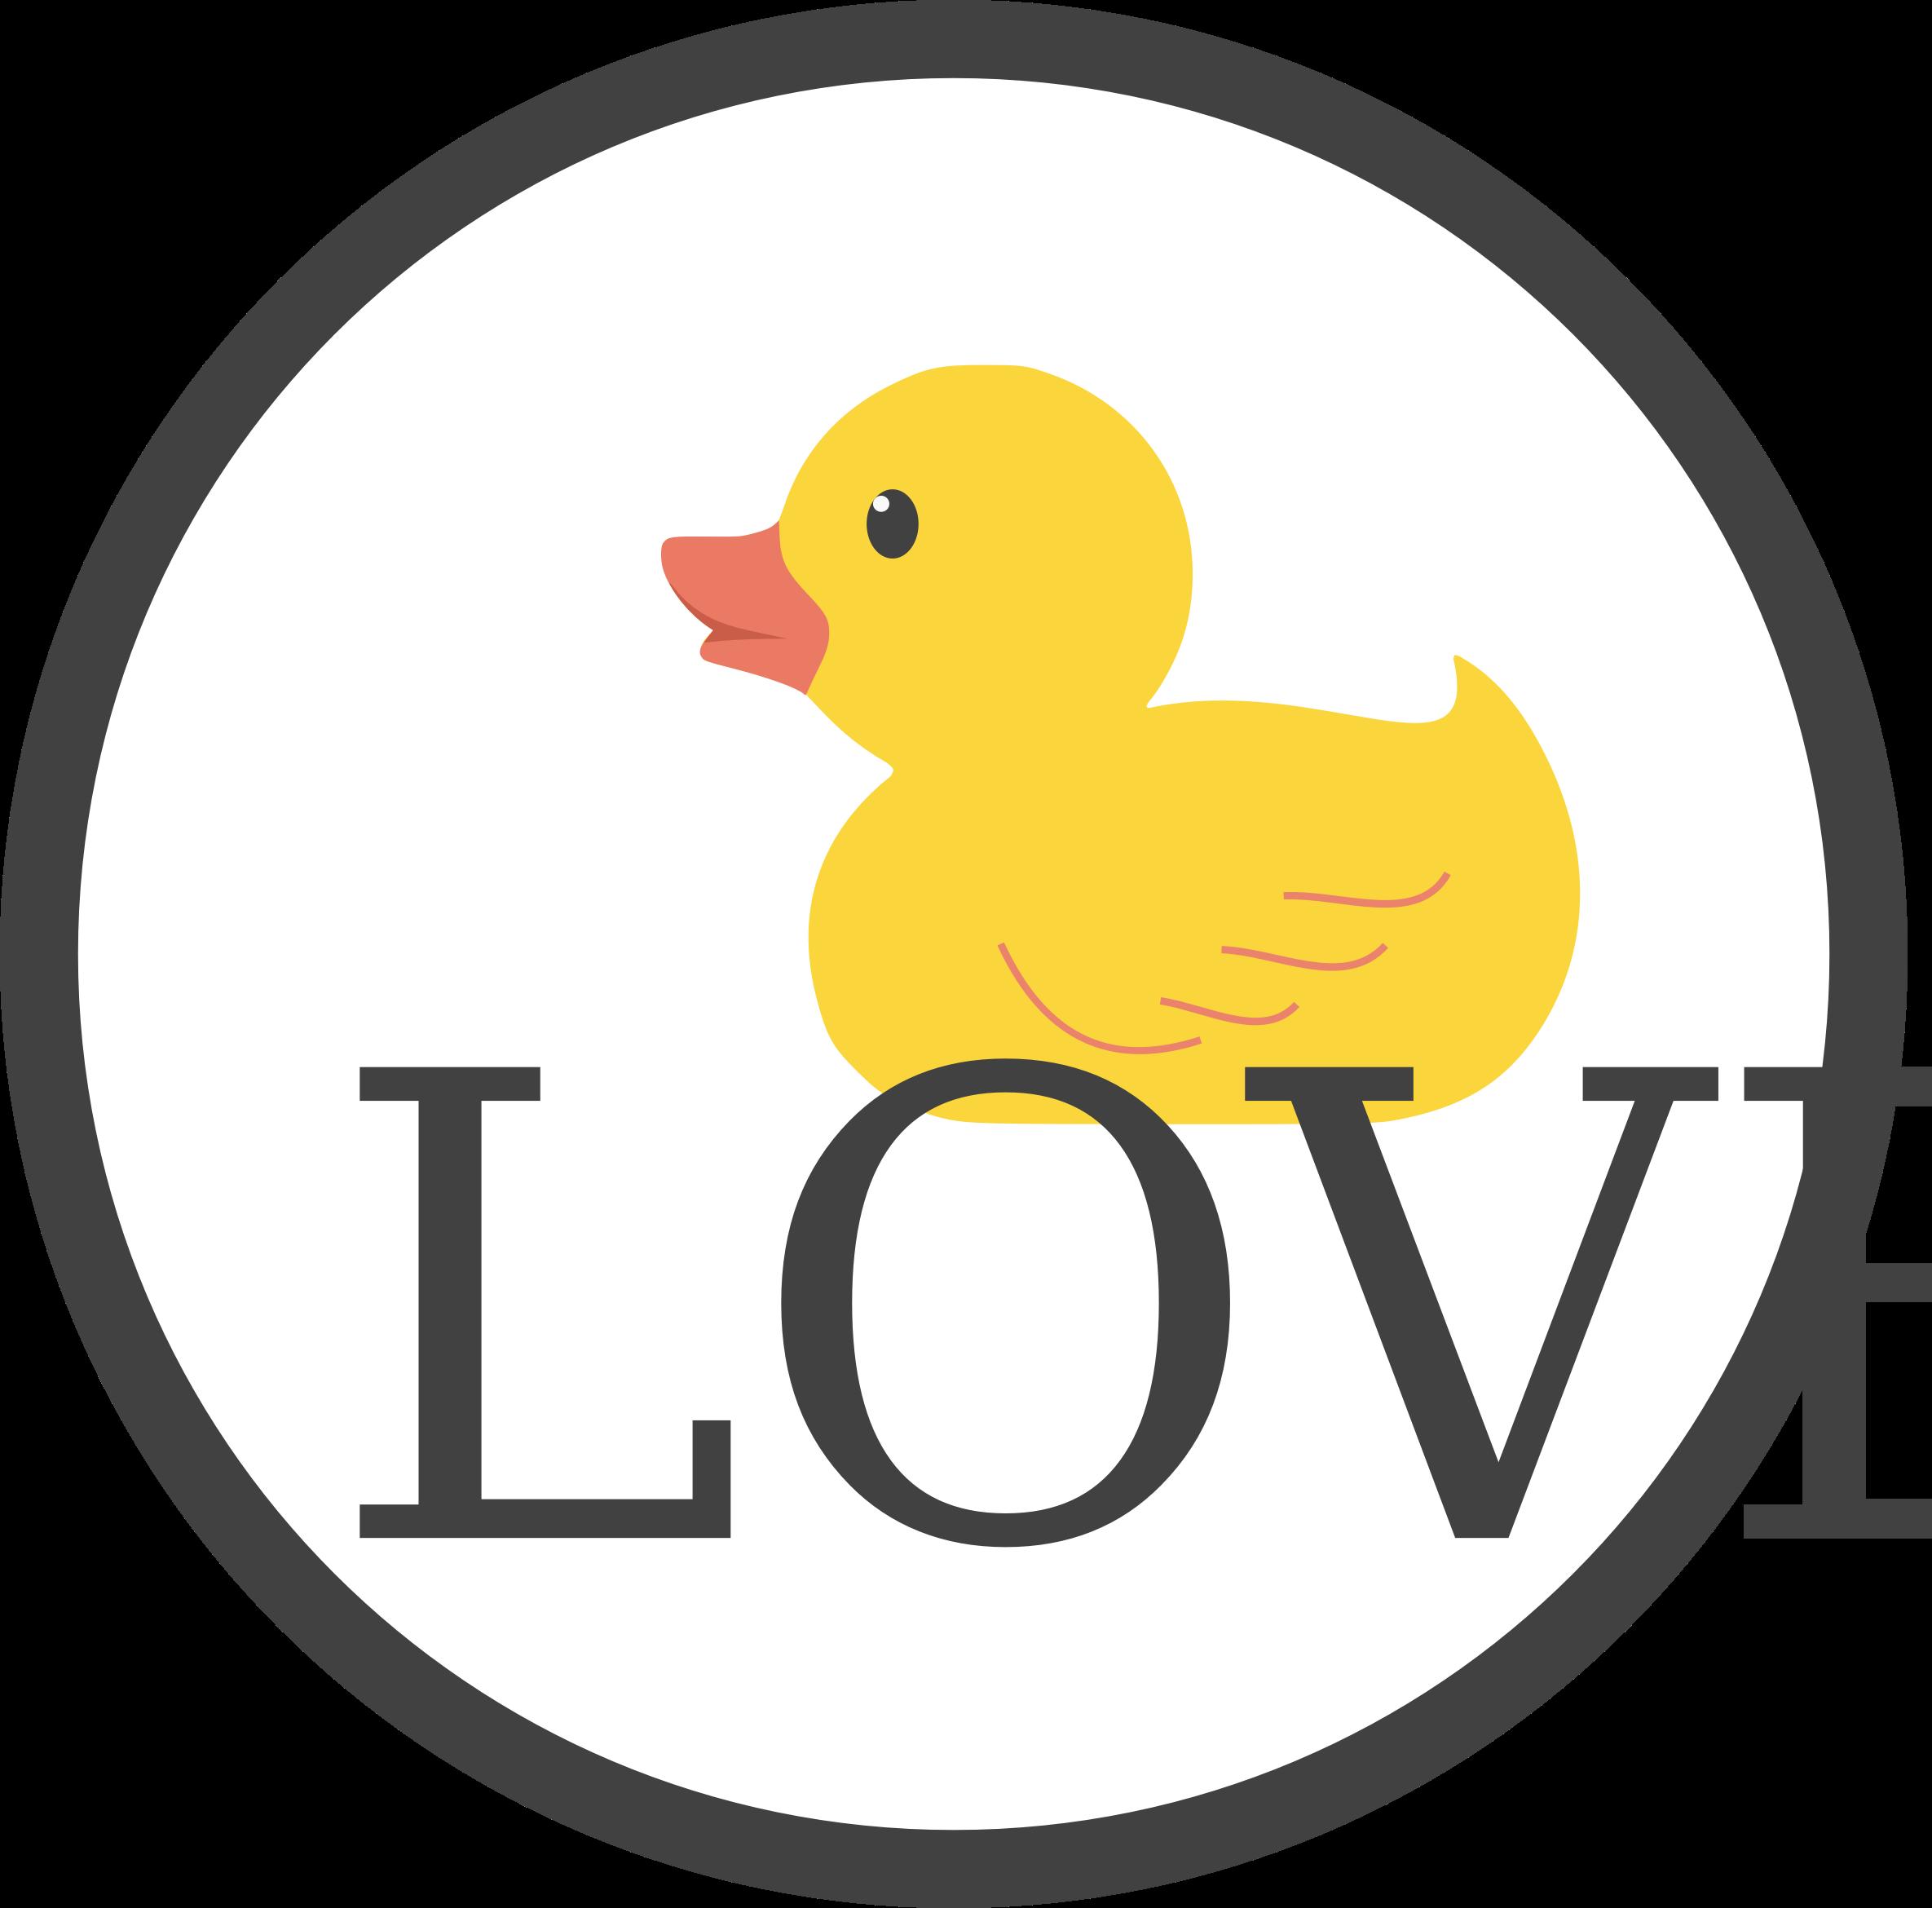 Duck love big image. Ducks clipart yellow